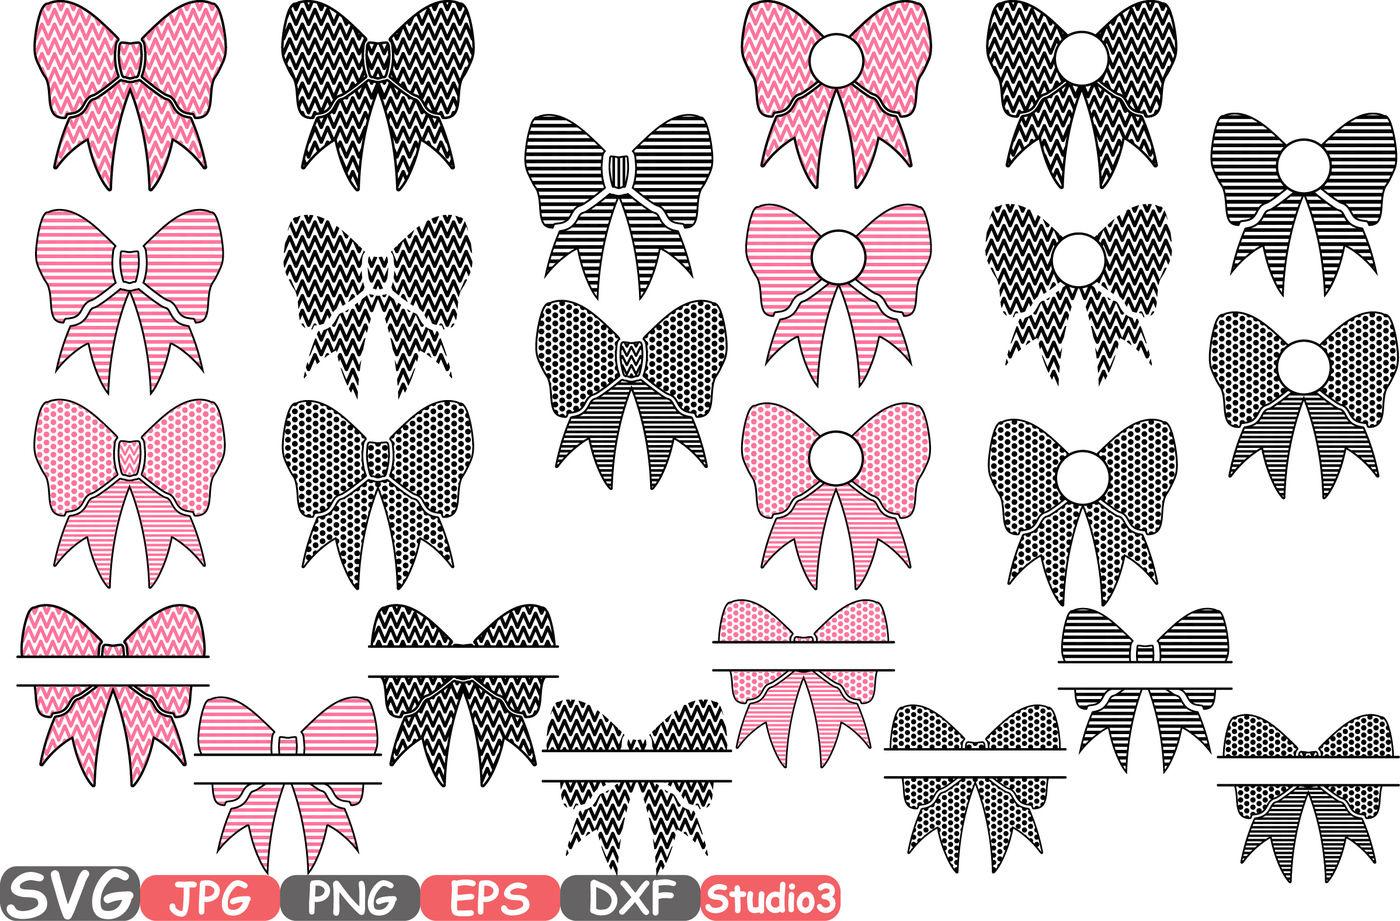 Patterned Bows Frames Svg Silhouette Cutting Files Cricut Split